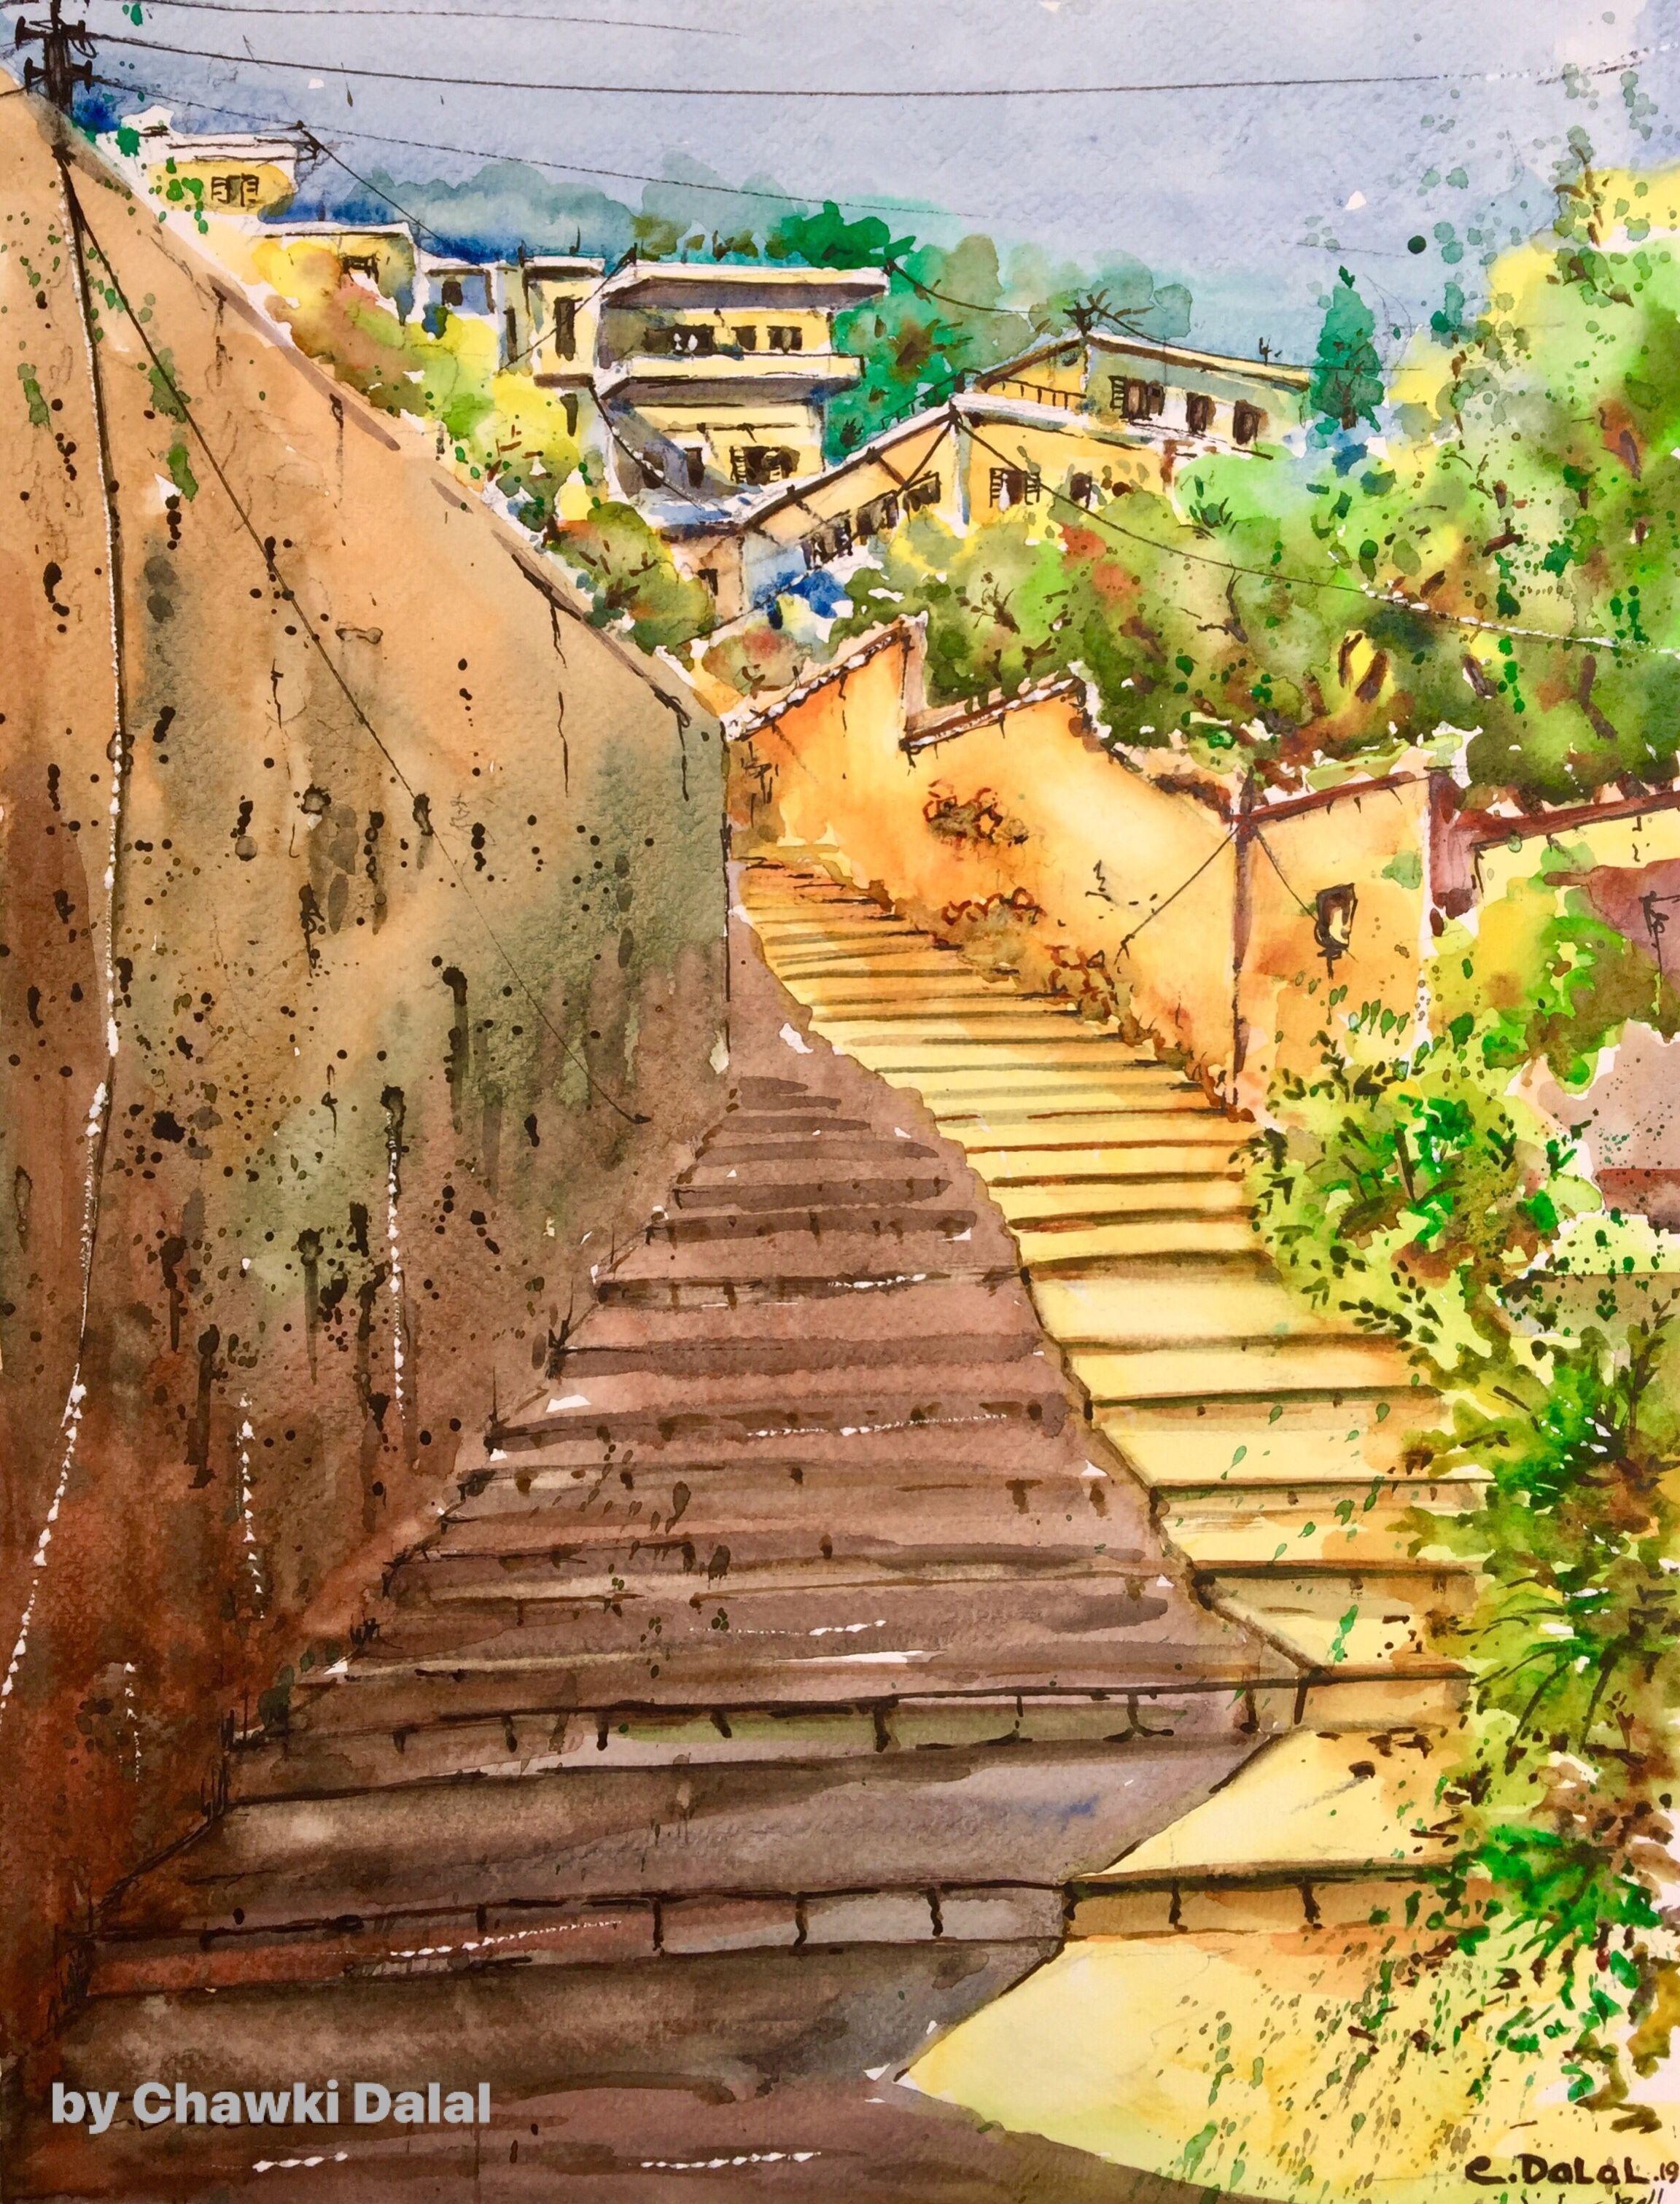 Water Painting By Artist Chawki Dalal Lebanon لوحة جديدة من الهرمل لبنان على هذا الدرج م ر طيف إينانا فف لش ت الاصفر وإخض و ض Sidewalk Art Structures